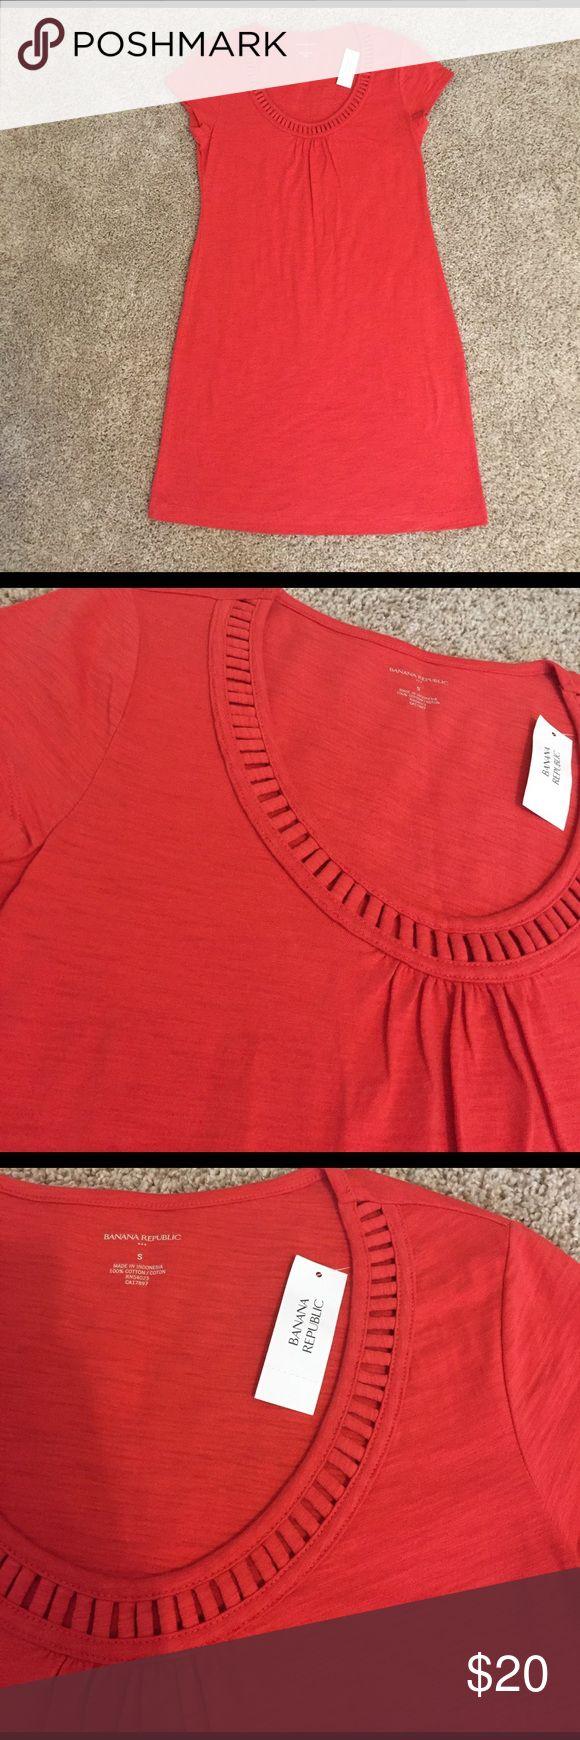 Red orange t shirt dress 100% cotton. Bundles available! Banana Republic Dresses